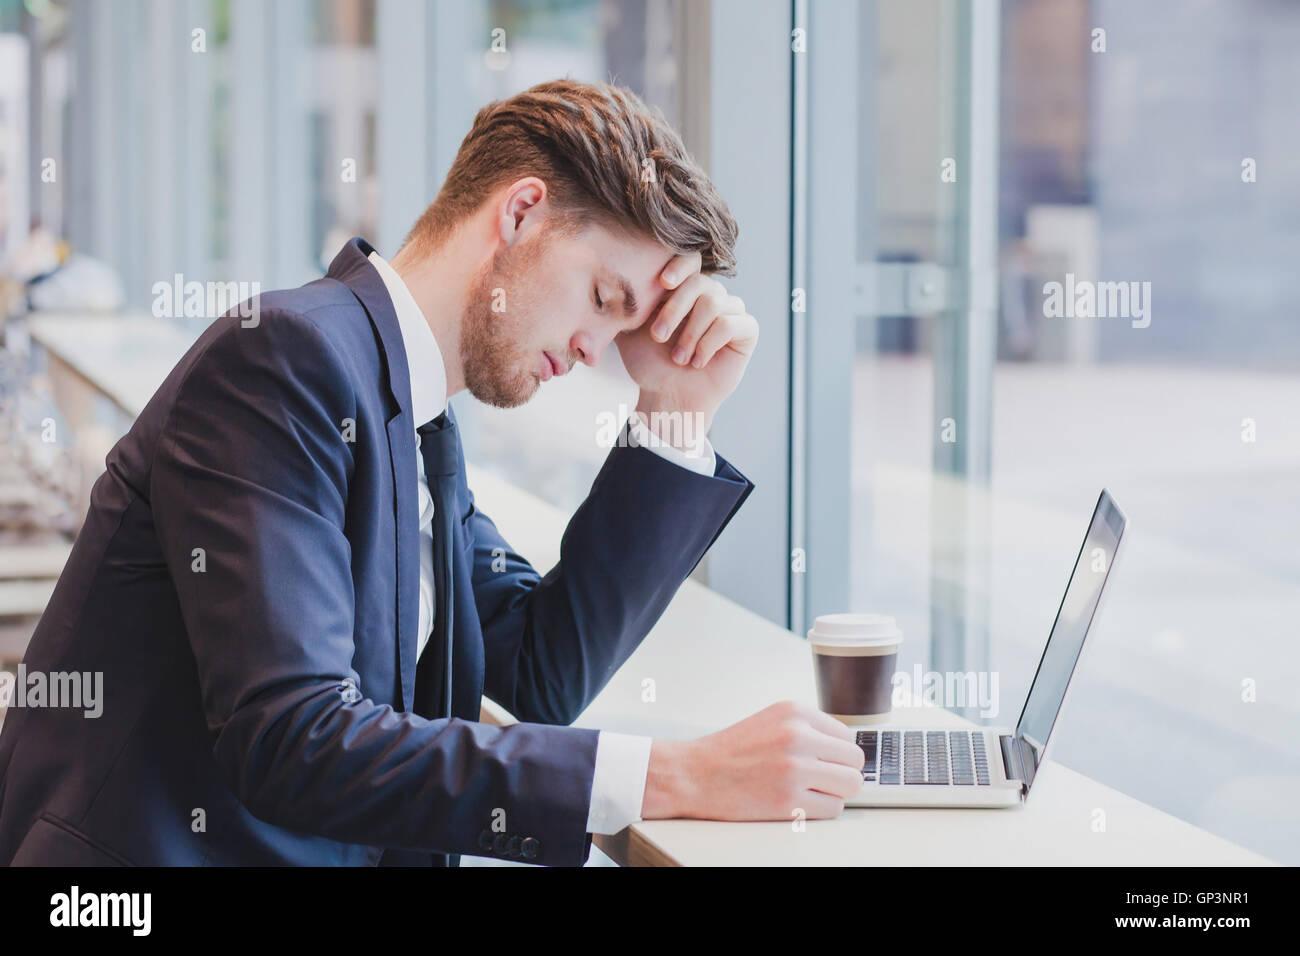 Dolor de cabeza, cansado hombre de negocios cerca de laptop Imagen De Stock